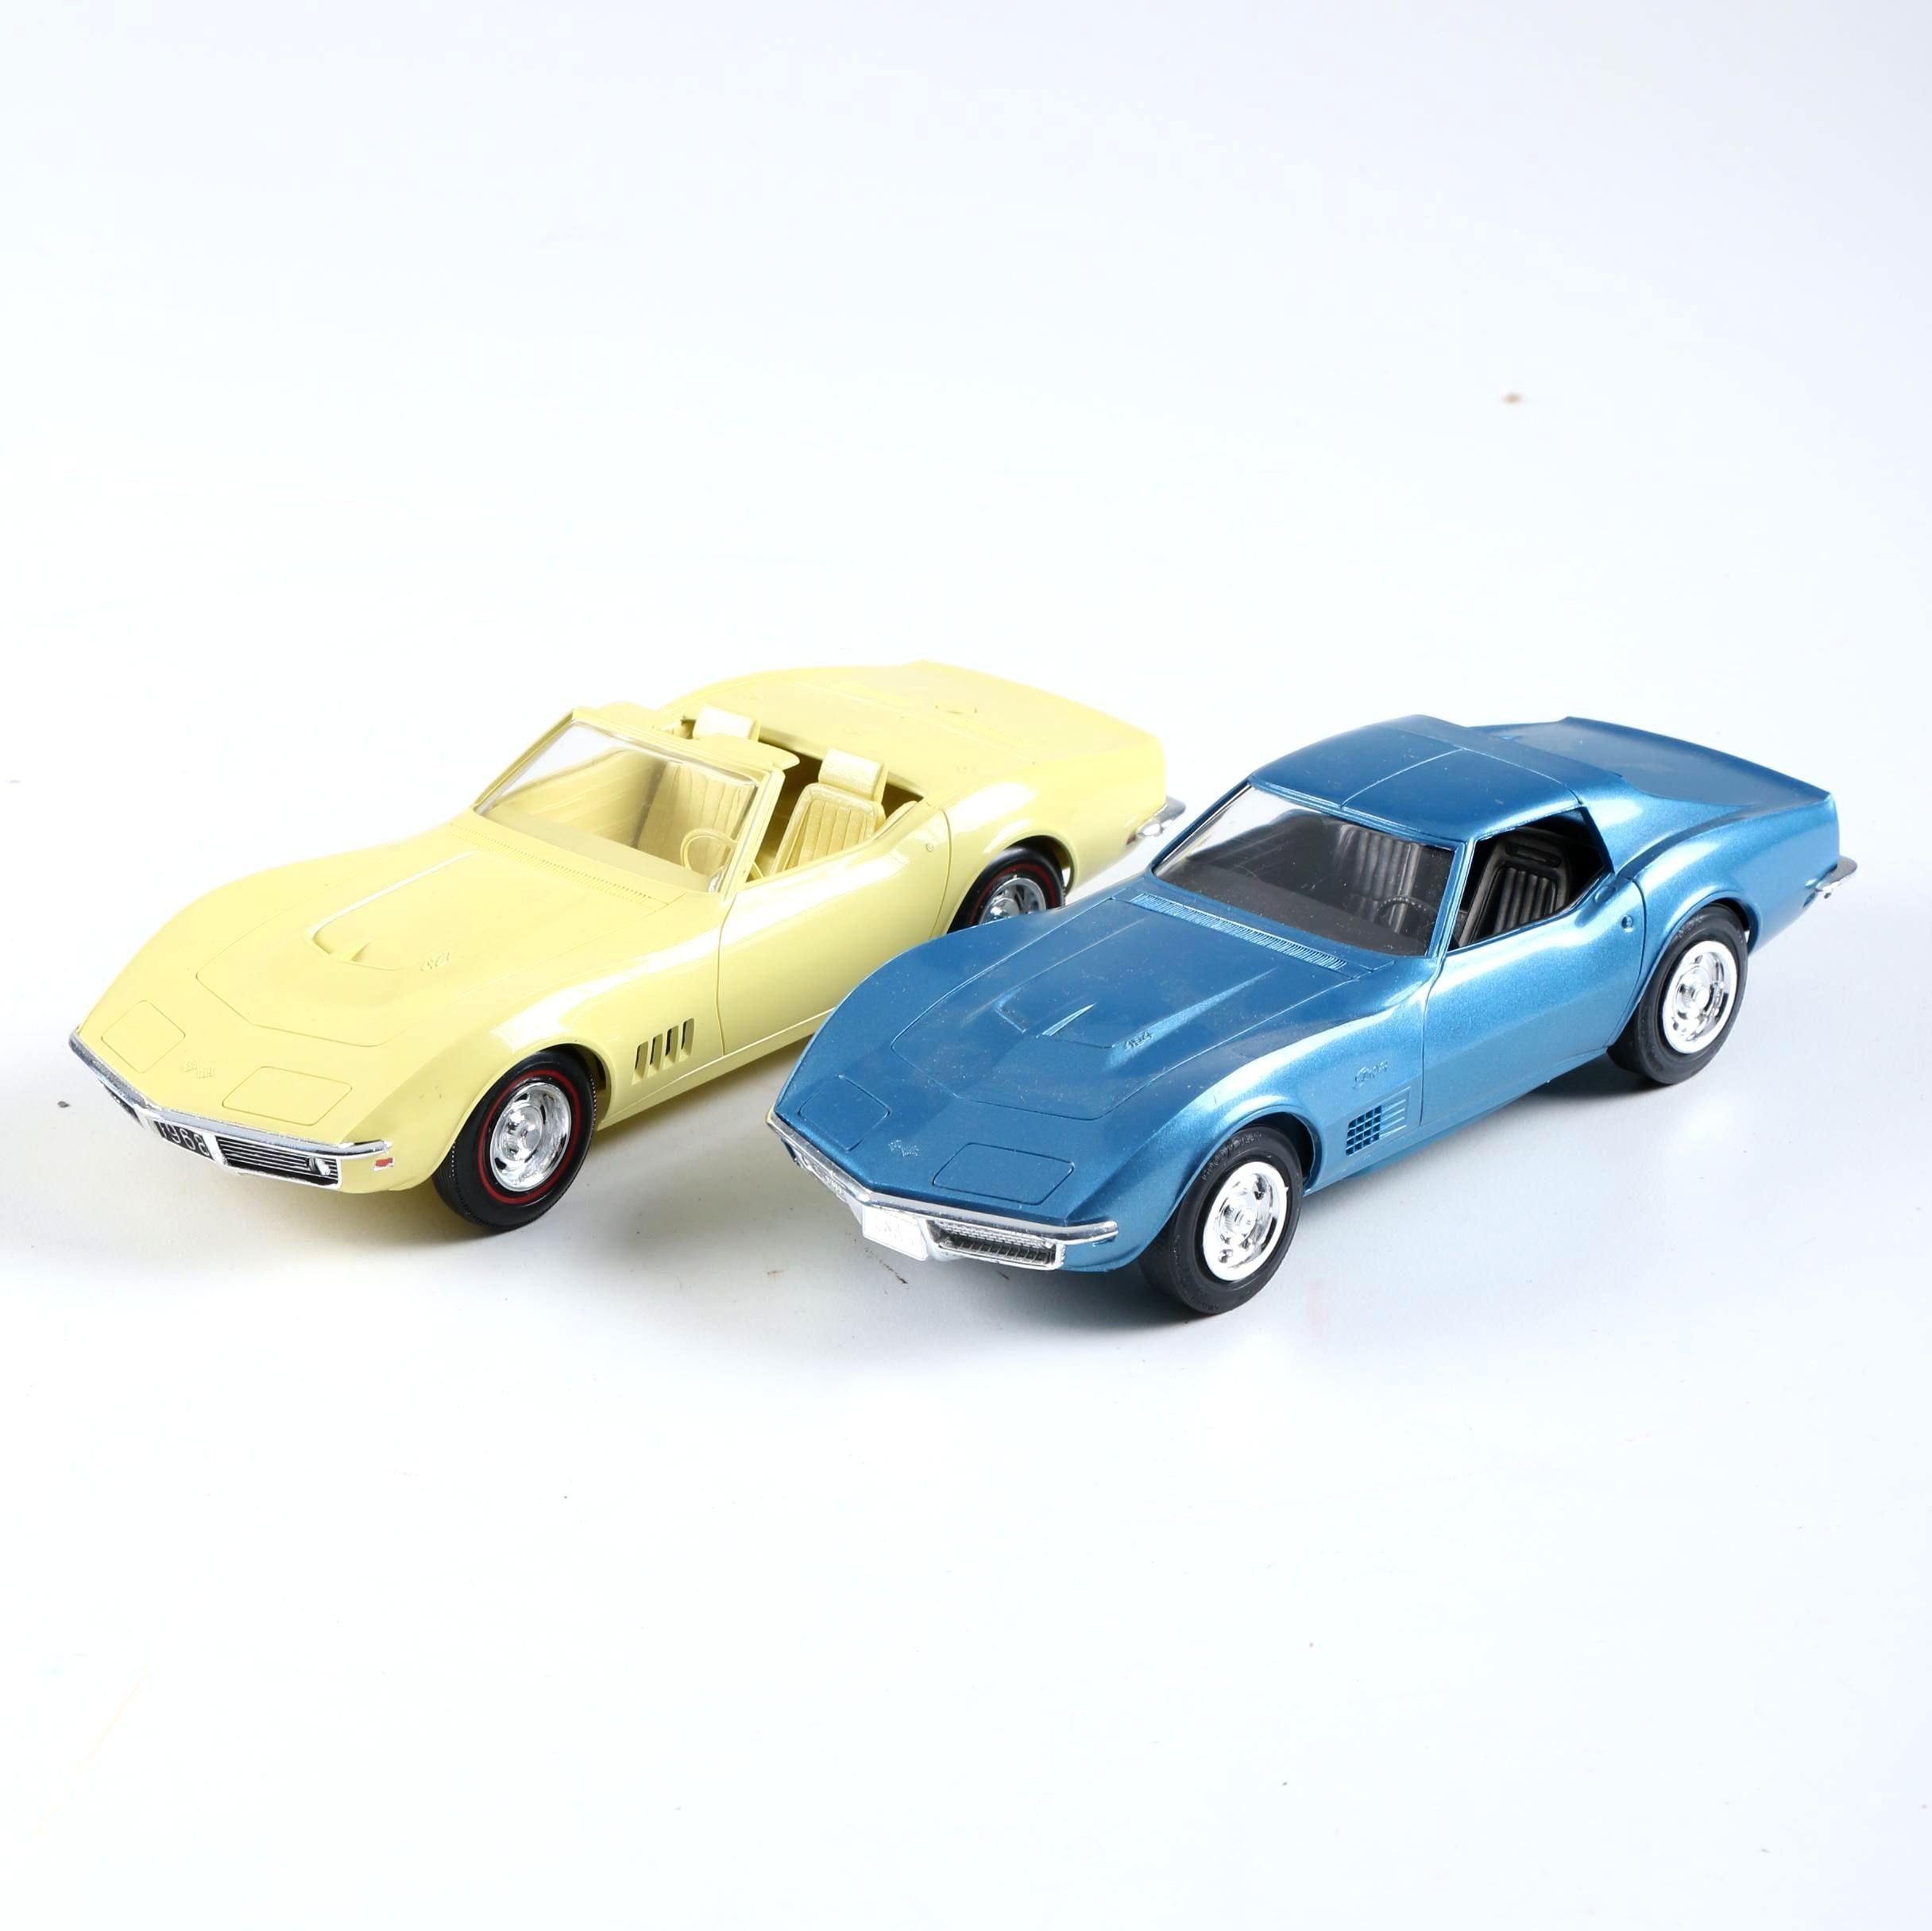 Pair of Chevrolet Corvette Promo Cars